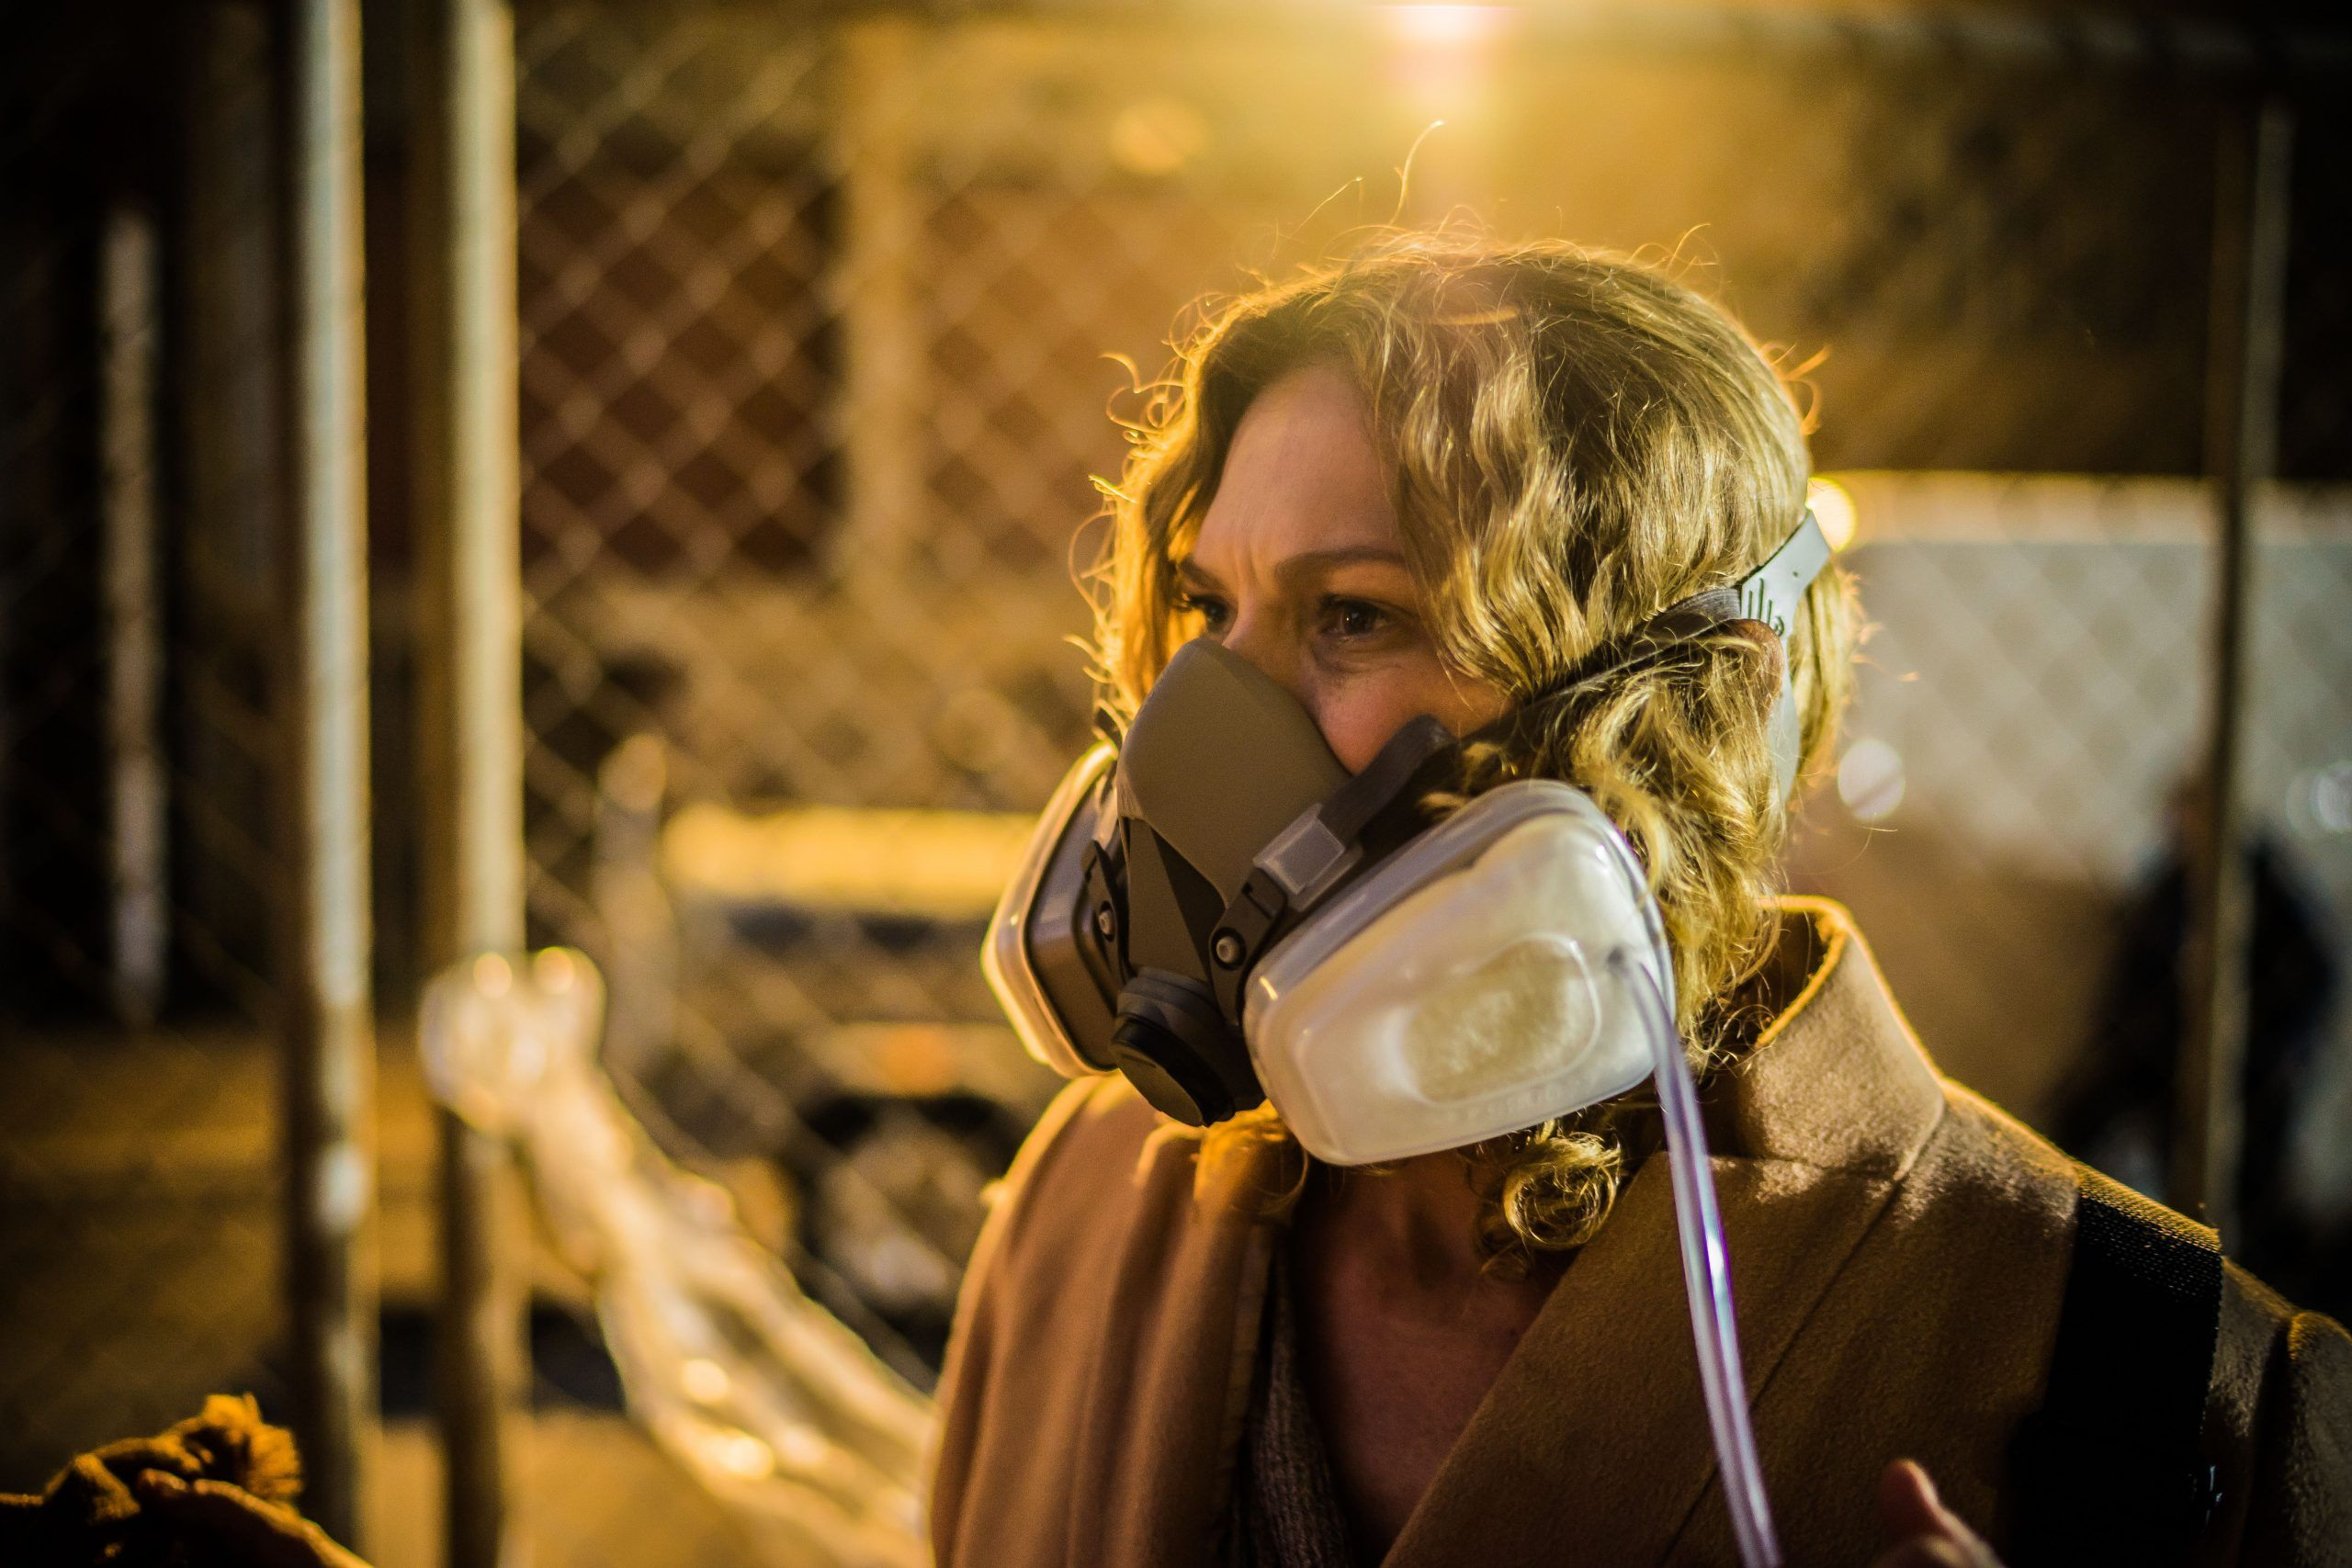 2067 Trailer Puts Kodi Smit-McPhee at Center of Post-Apocalyptic Sci-Fi |  Collider